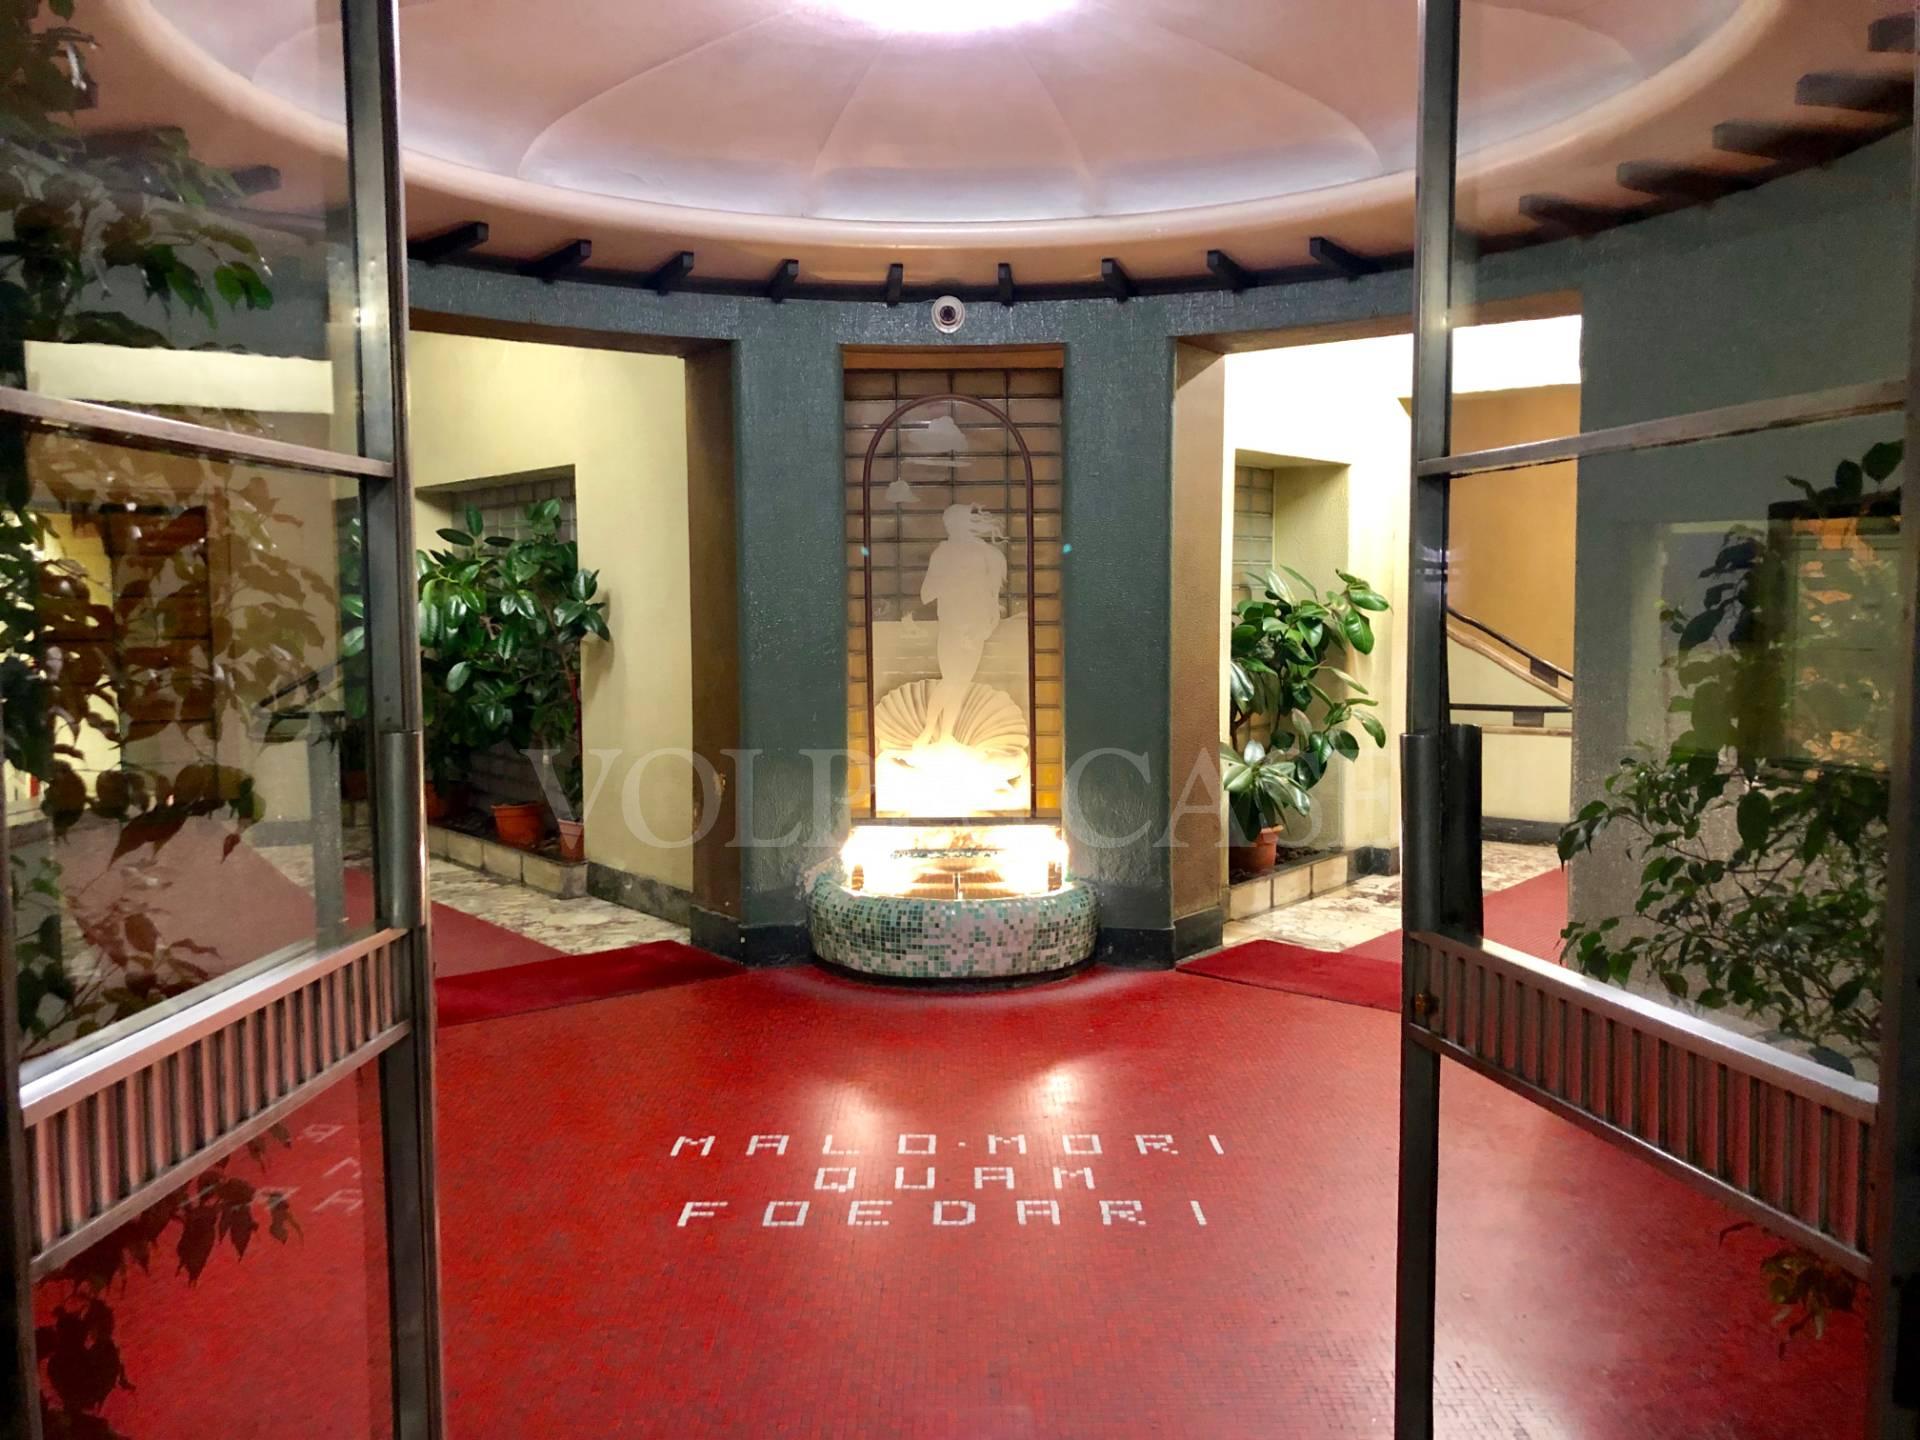 Appartamento ROMA vendita  Bologna  Volpes Case srl